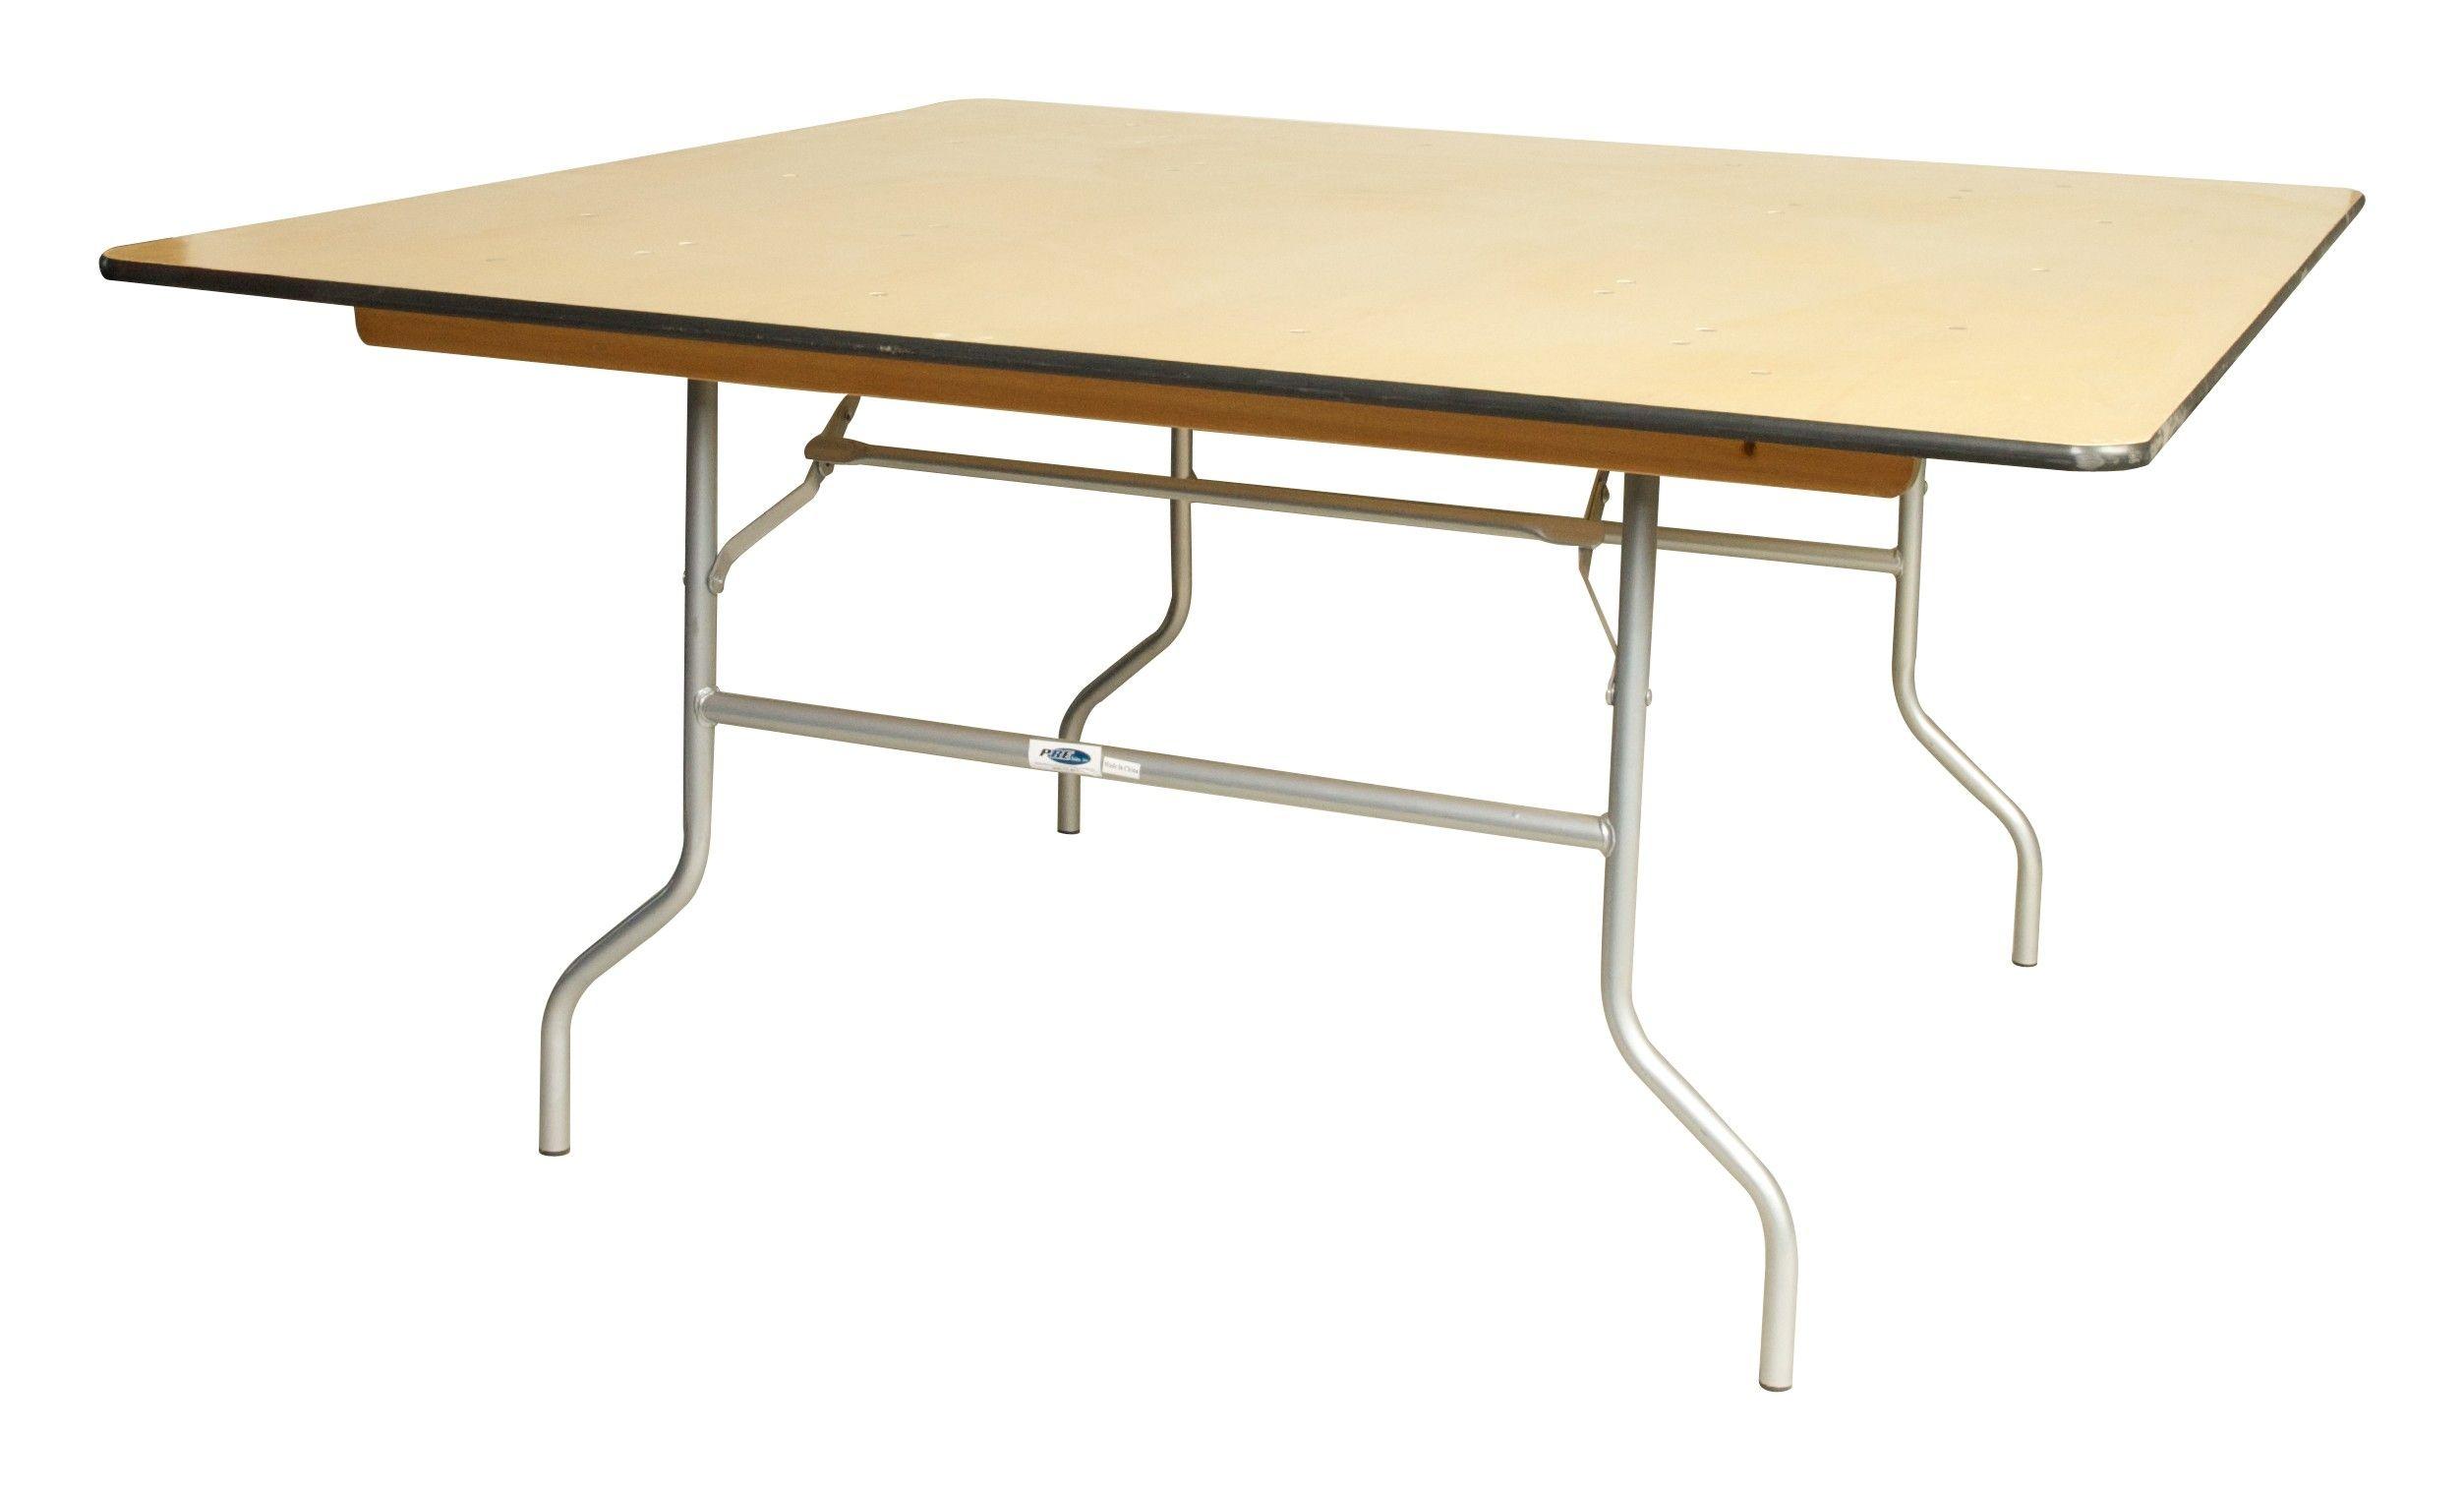 Charming 48 X 48 Square Folding Table